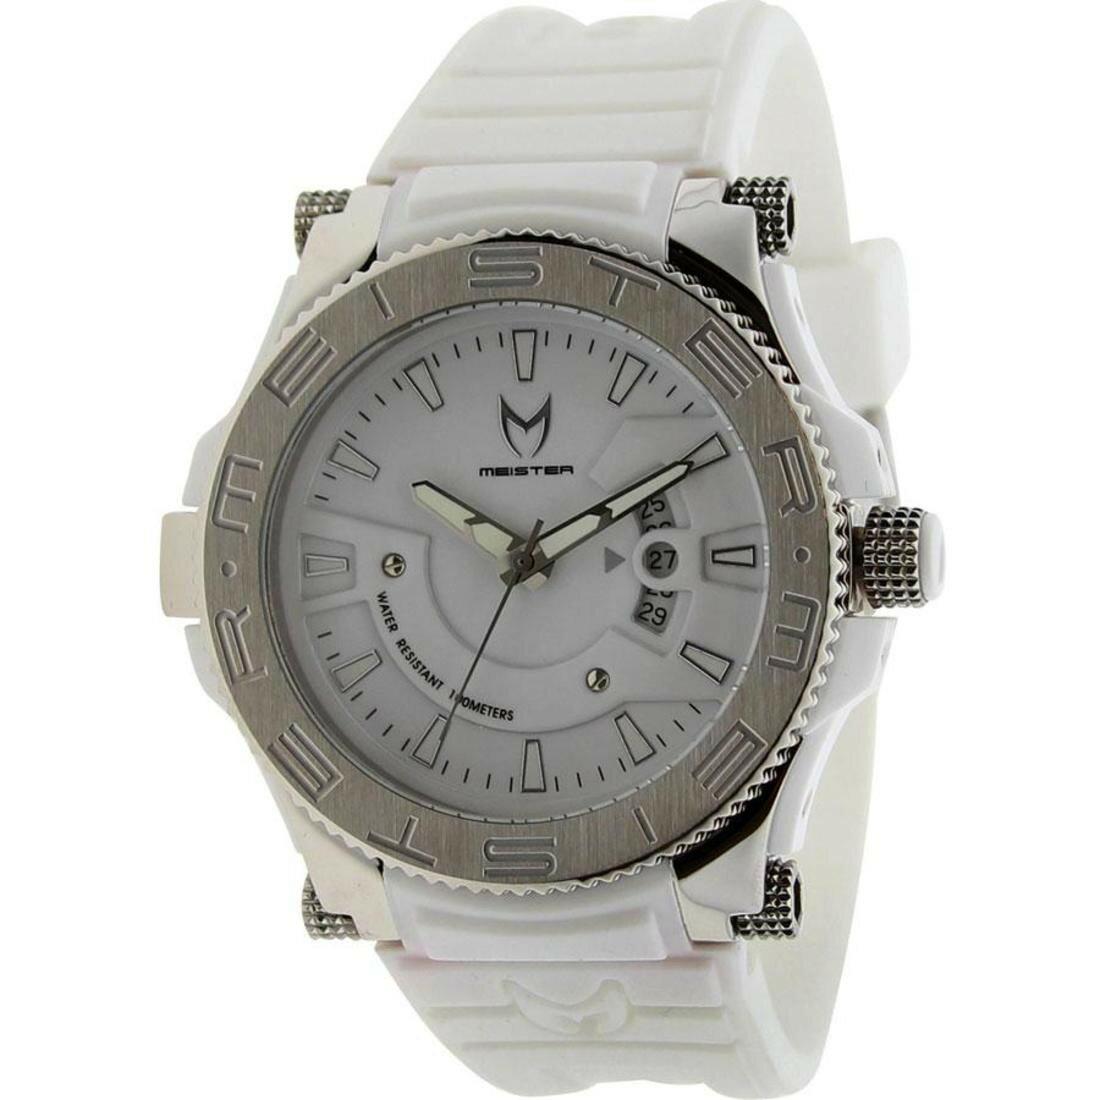 meister prodigy プロディジー stainless ステンレス watch ウォッチ 時計 white silver 銀色 シルバー 白 ホワイト rubber ラバー band 腕時計 男女兼用腕時計